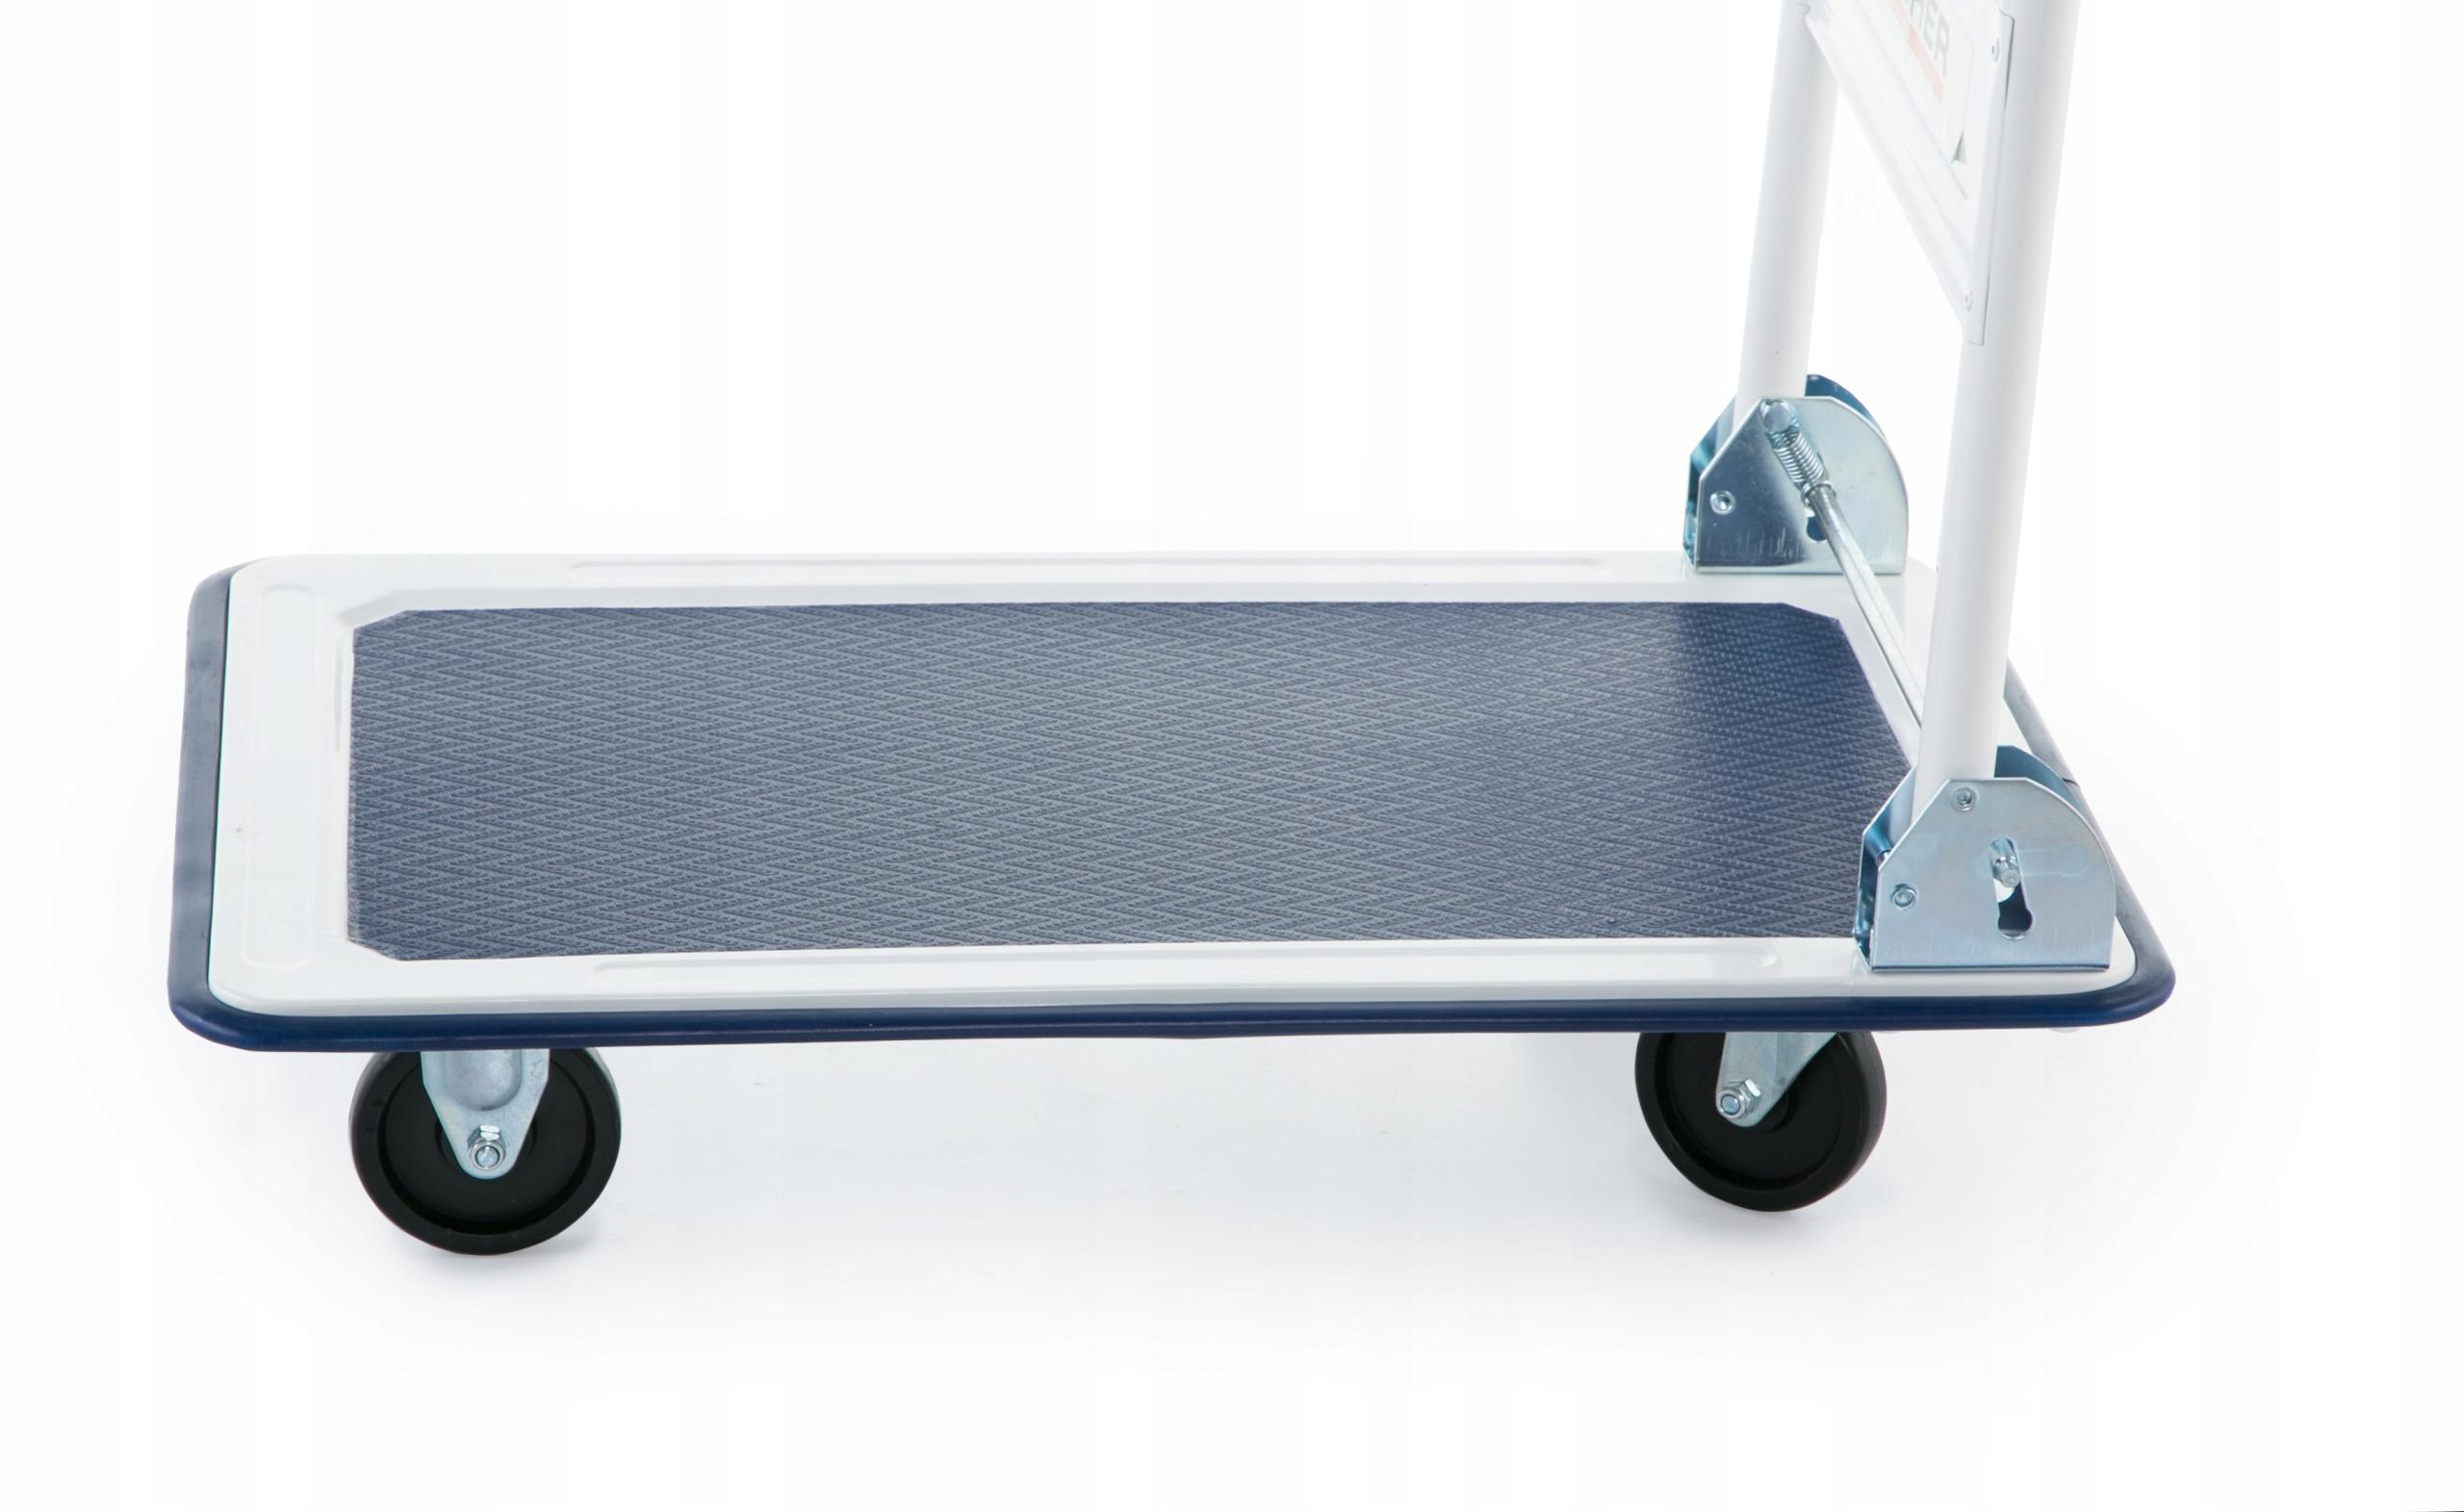 Коляска platformowy транспортная складская позиция 150 кг